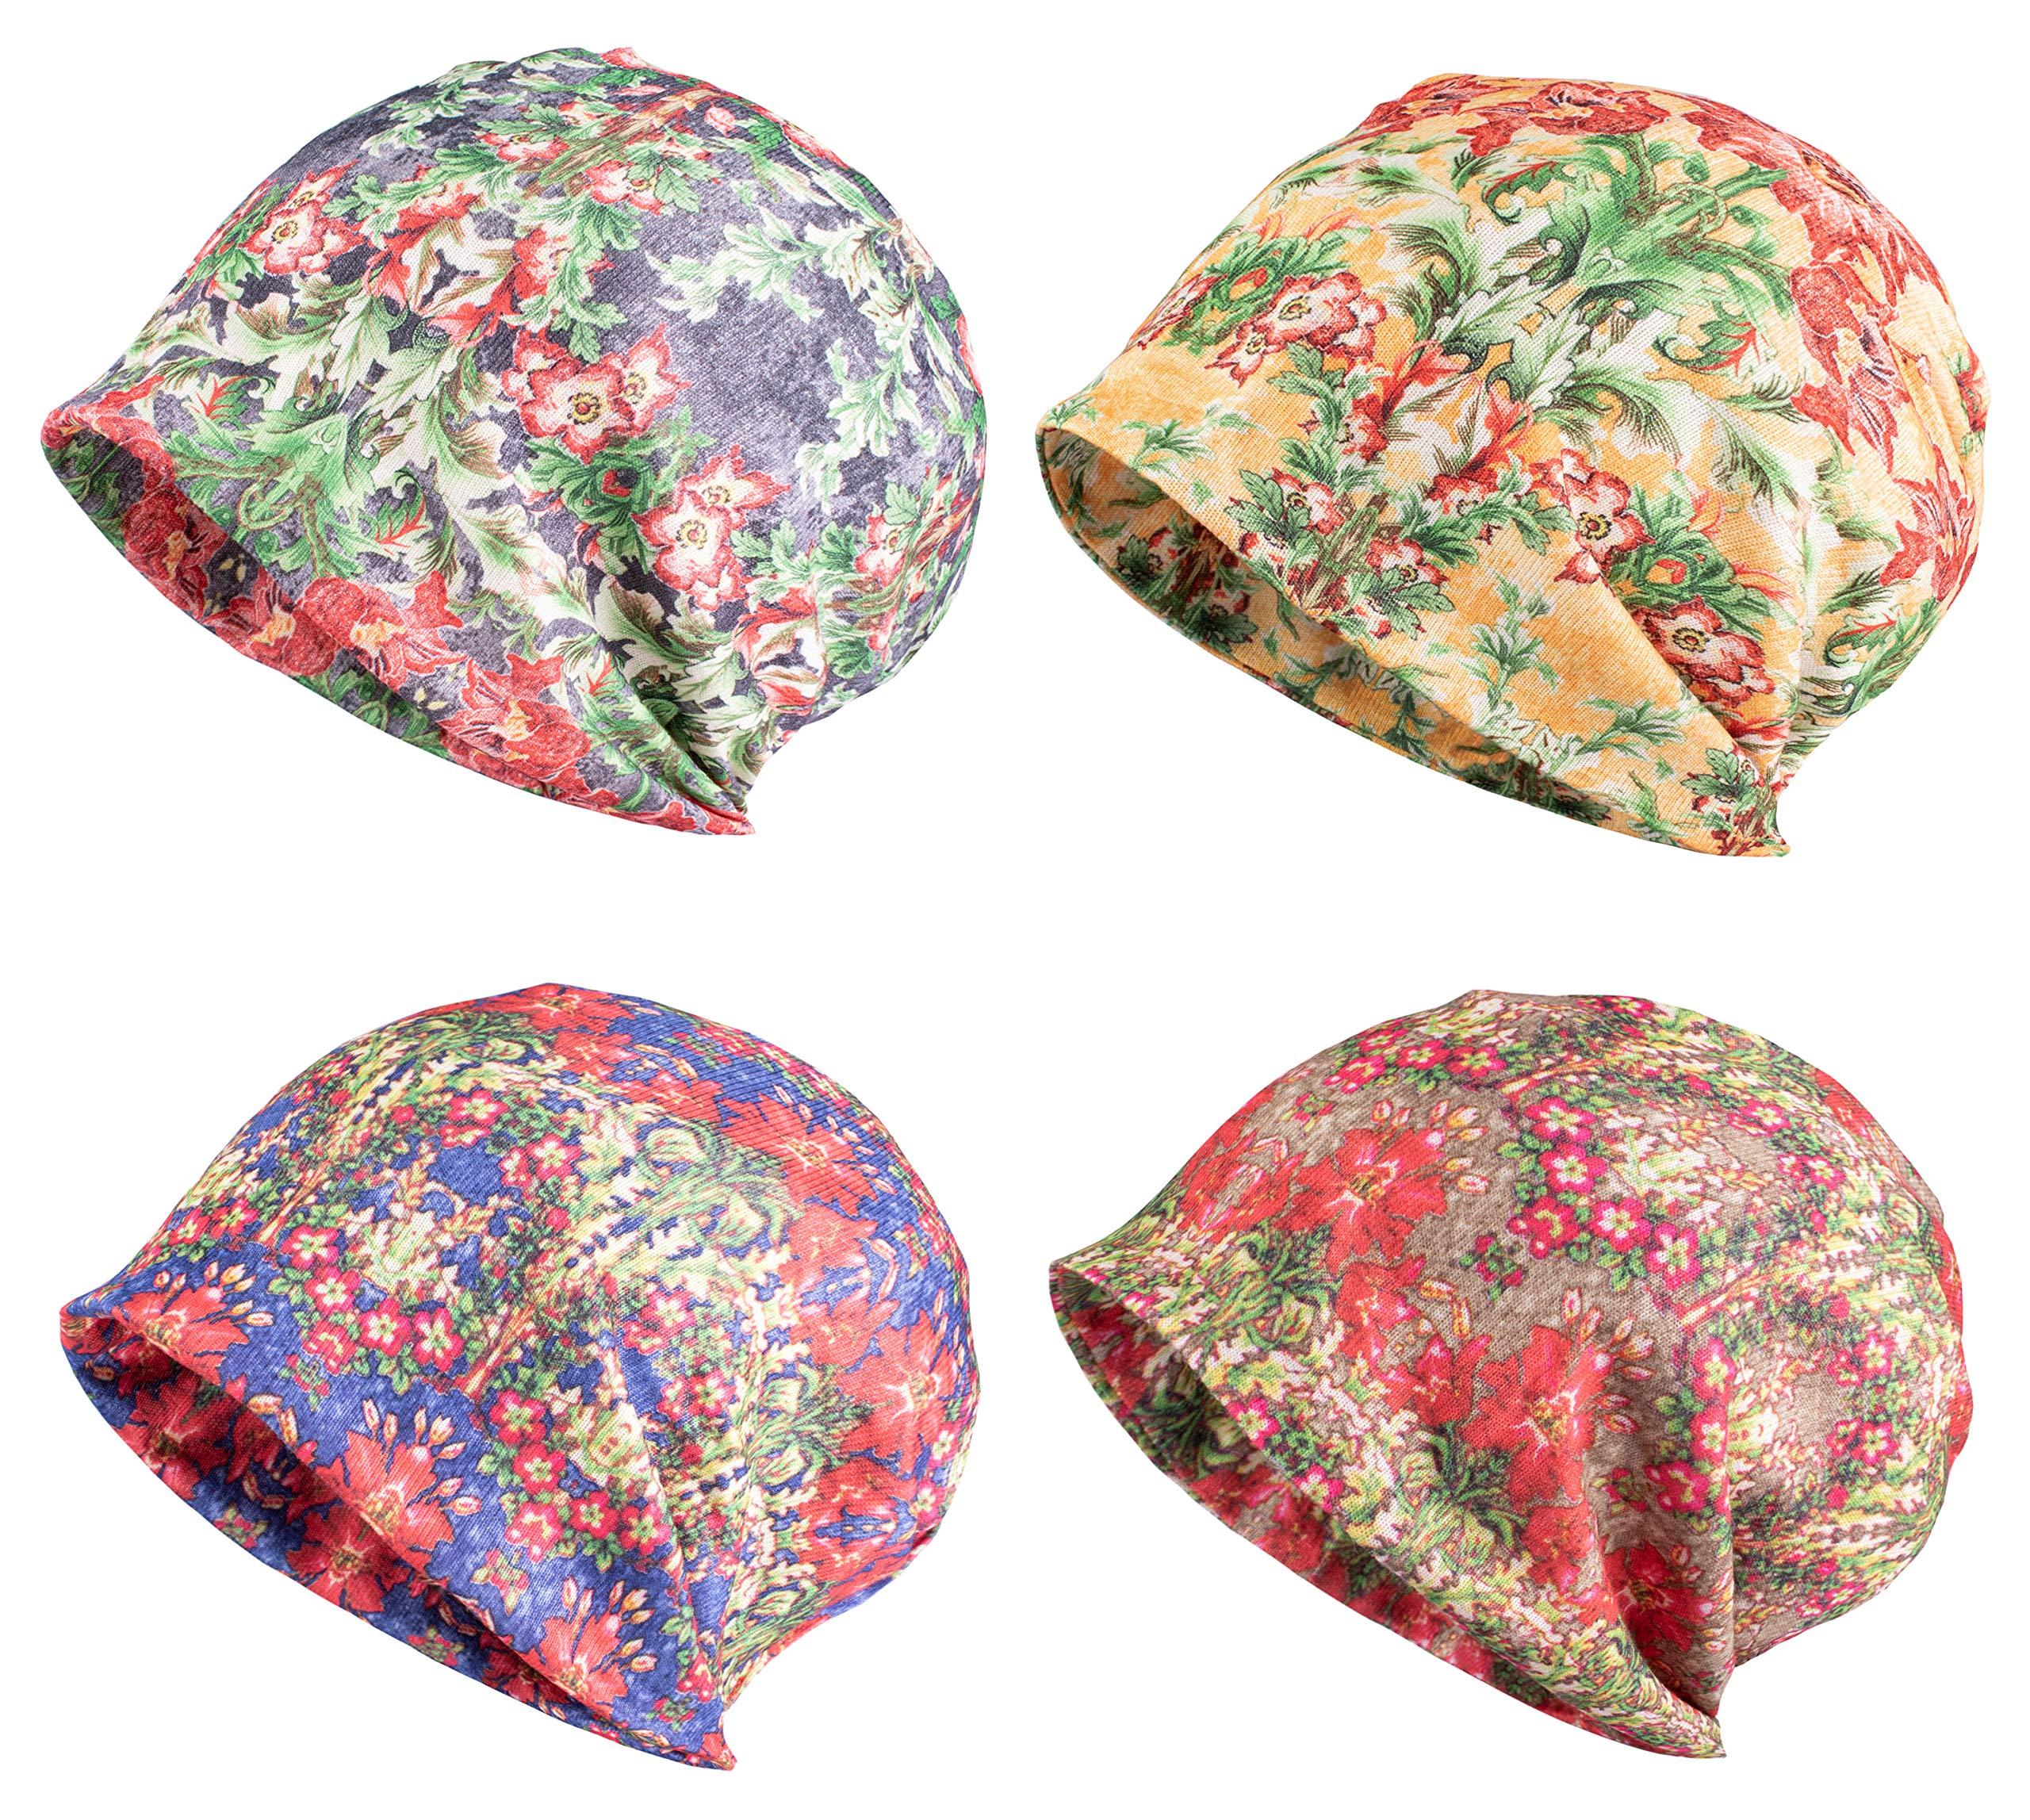 Jemis Skullies Beanies Thin Bonnet Cap Autumn Casual Beanies Hat (4 Pack Green & Red & Yellow & Blue) by Jemis